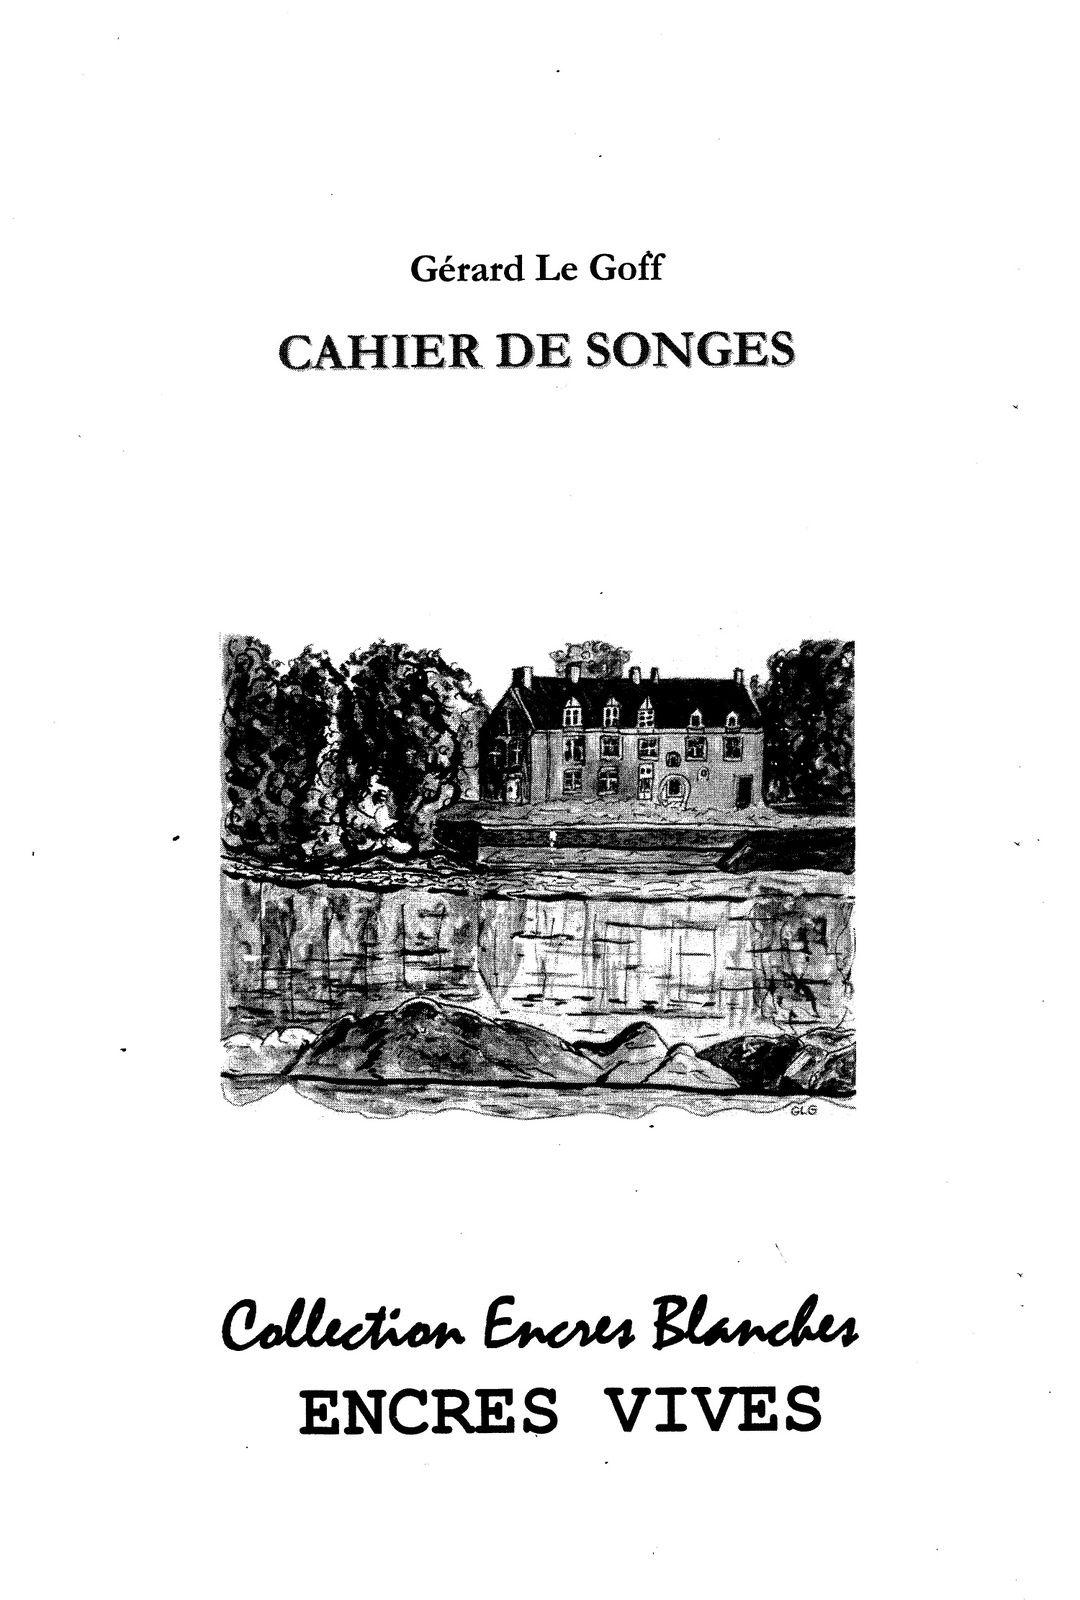 Cahier de songes (septembre 2018)- Gérard Le Goff . Editions Encres Vives, collection Encres Blanches .